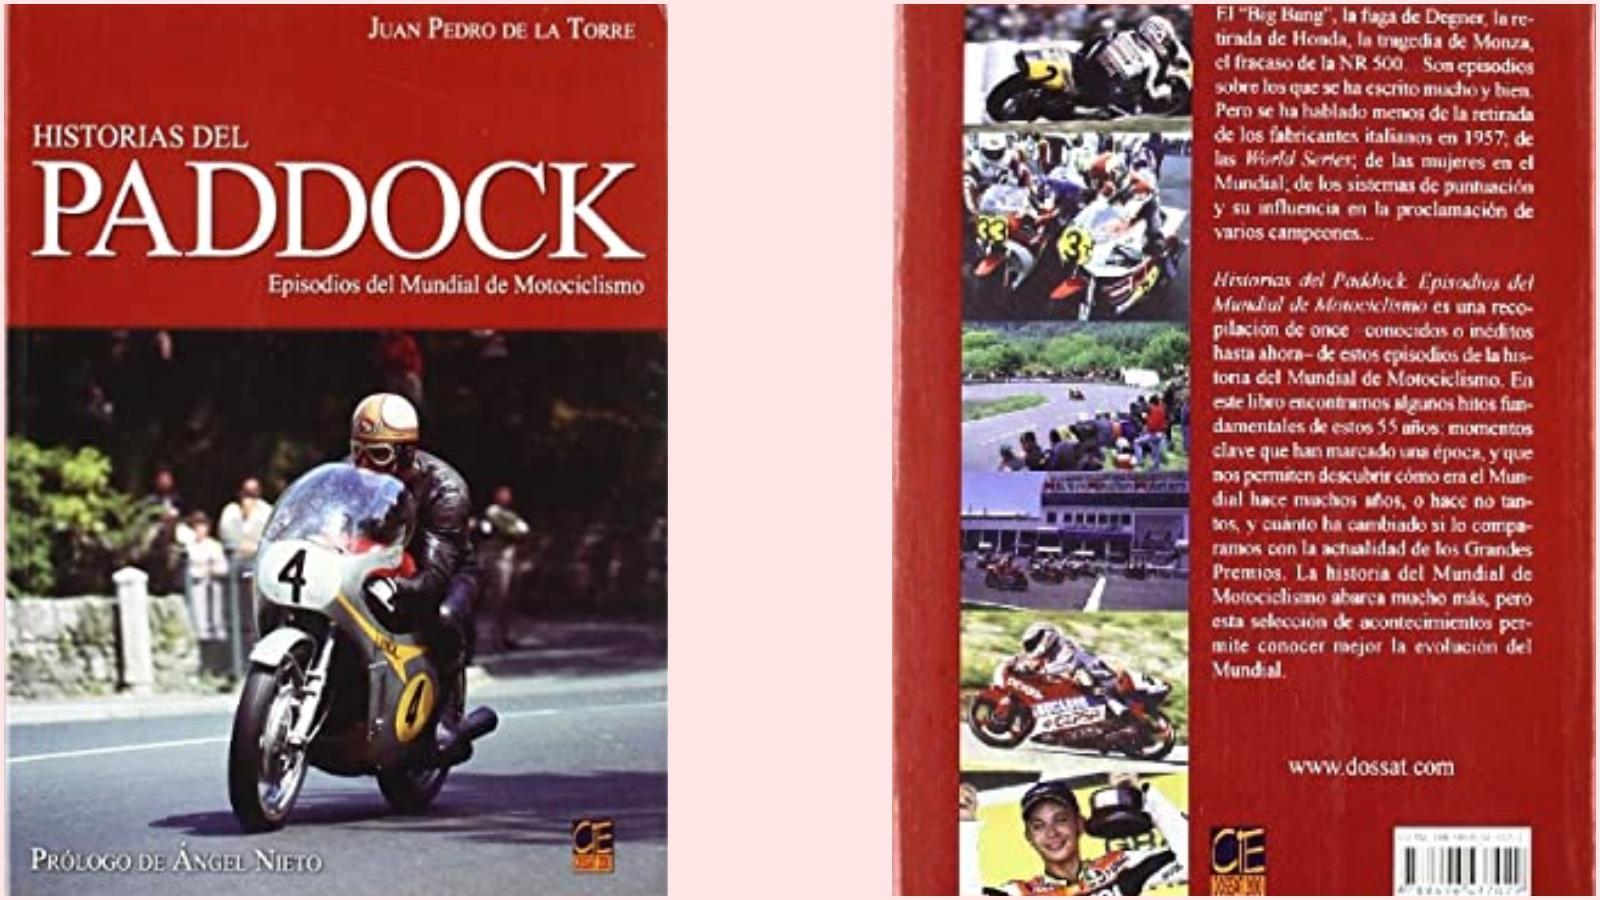 Historias del paddock / Juan Pedro de la Torre